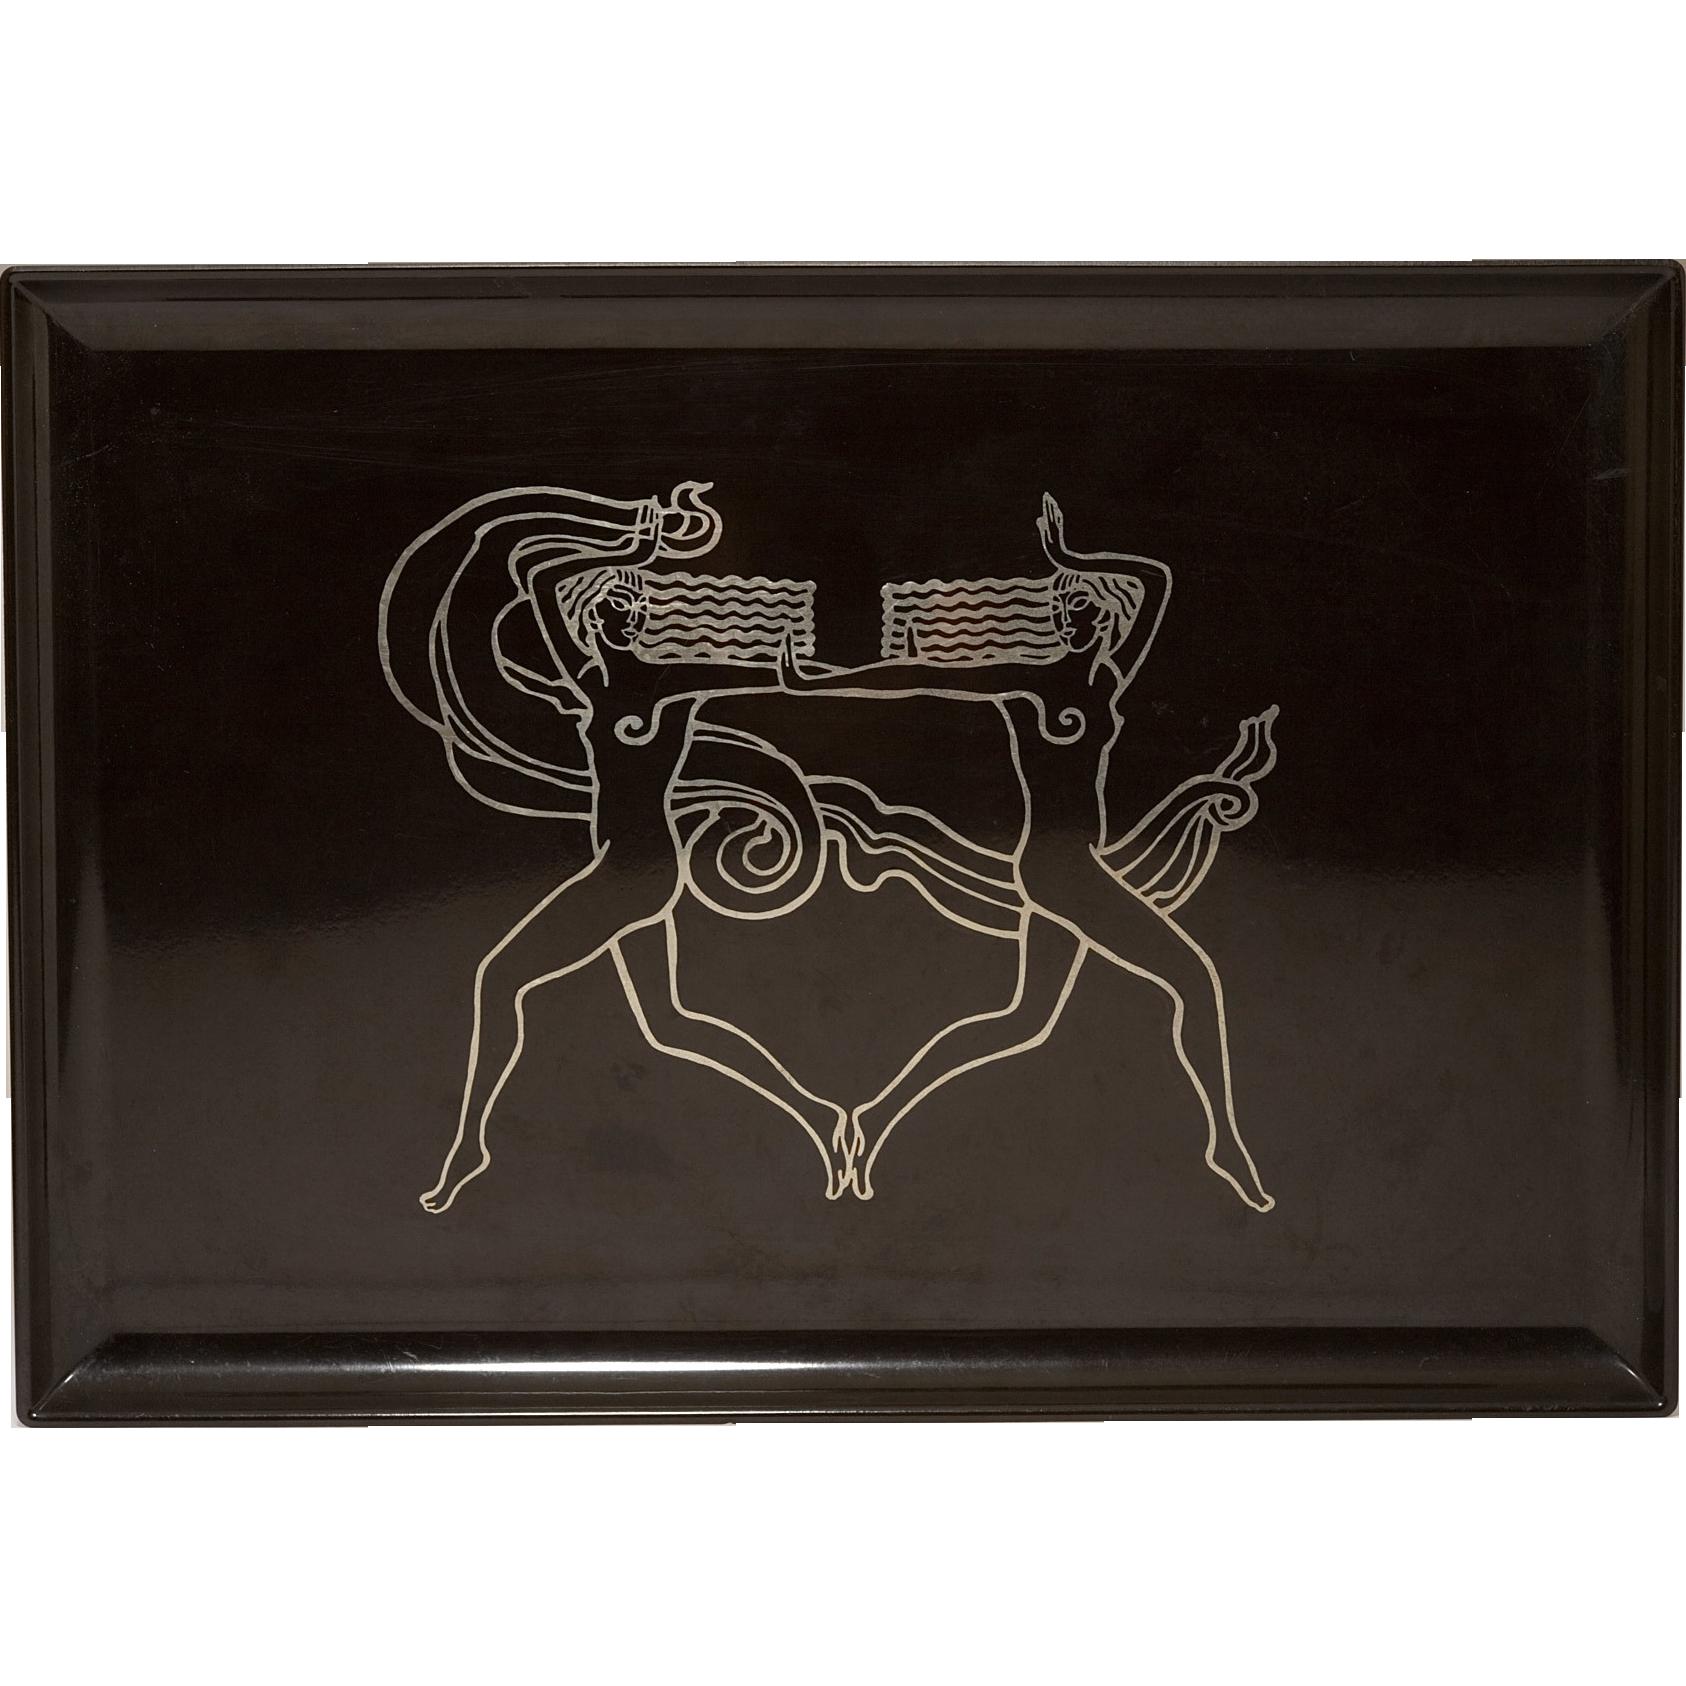 Vintage 1960-1970's Couroc of Monterey Art Deco Manner Platter